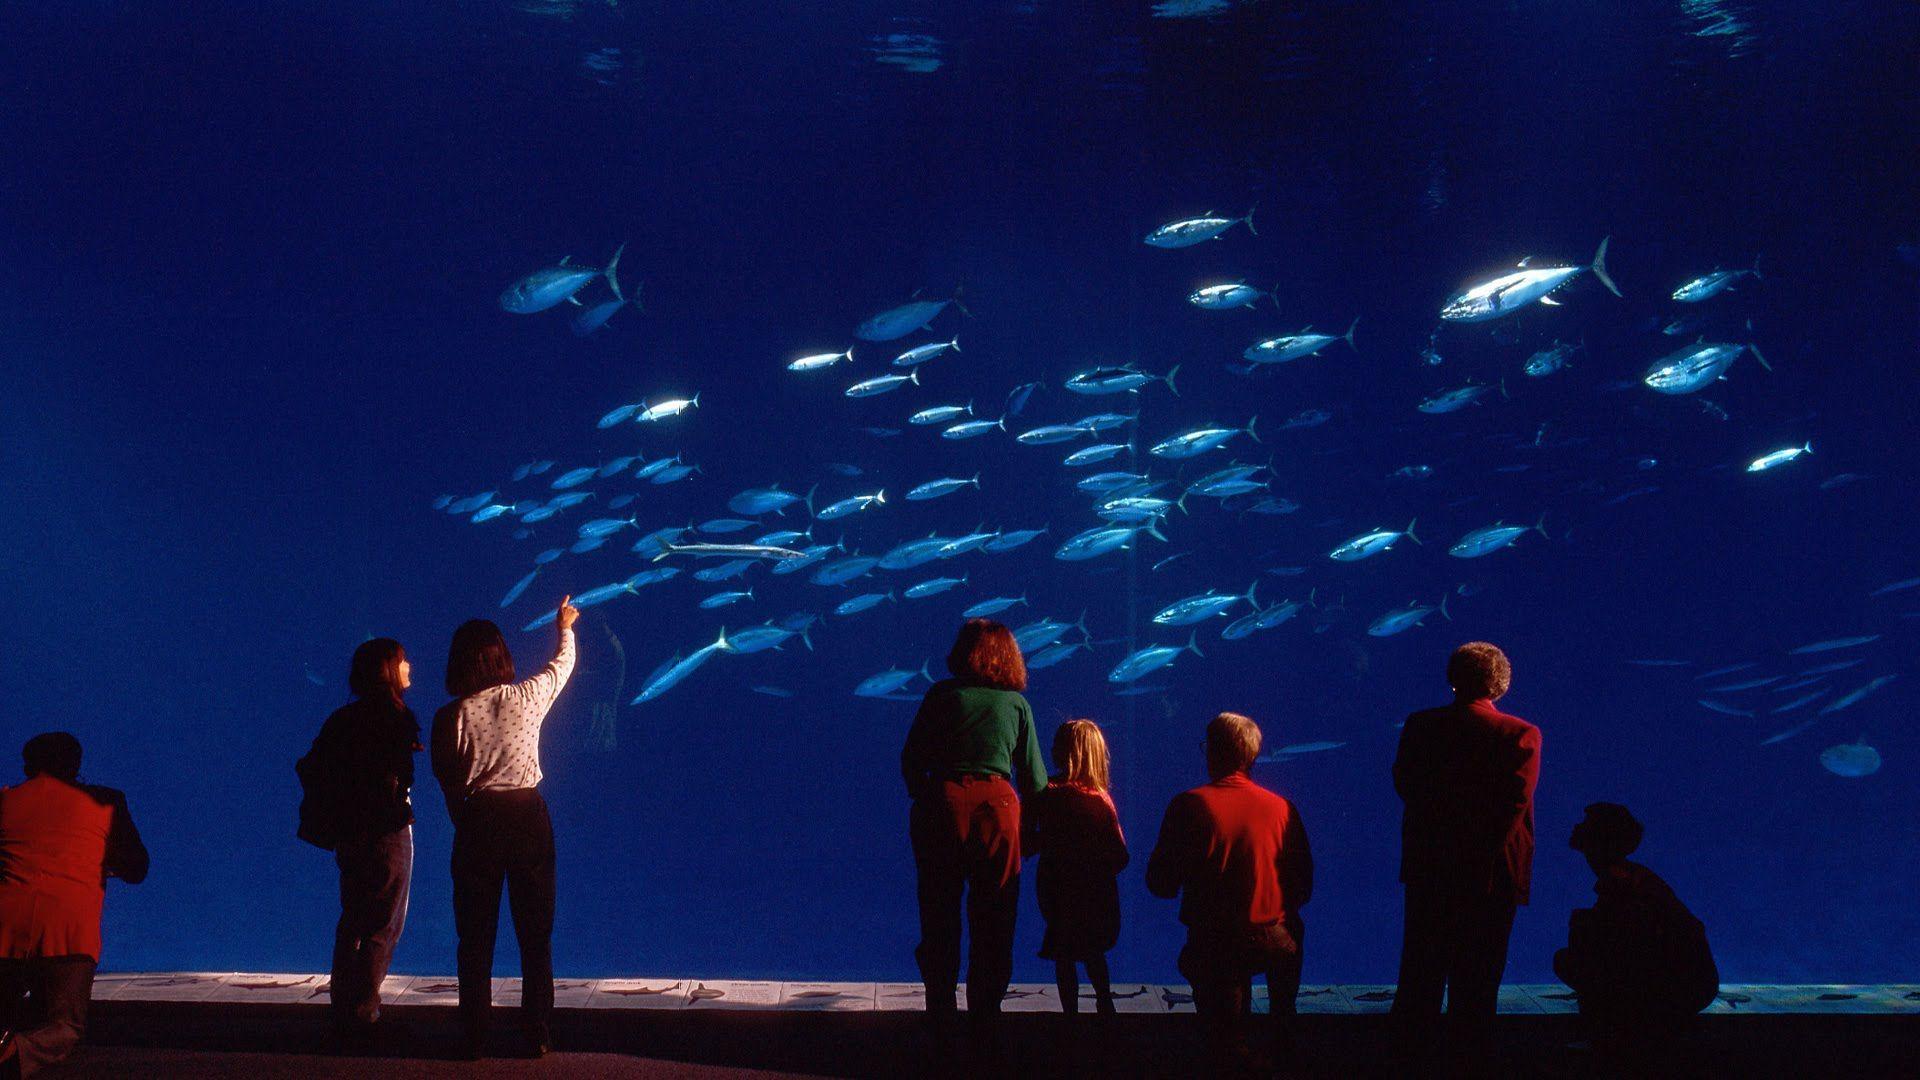 0d9722853f5025a8a1e9cde0d4928b1b Frais De Aquarium Tropical Schème